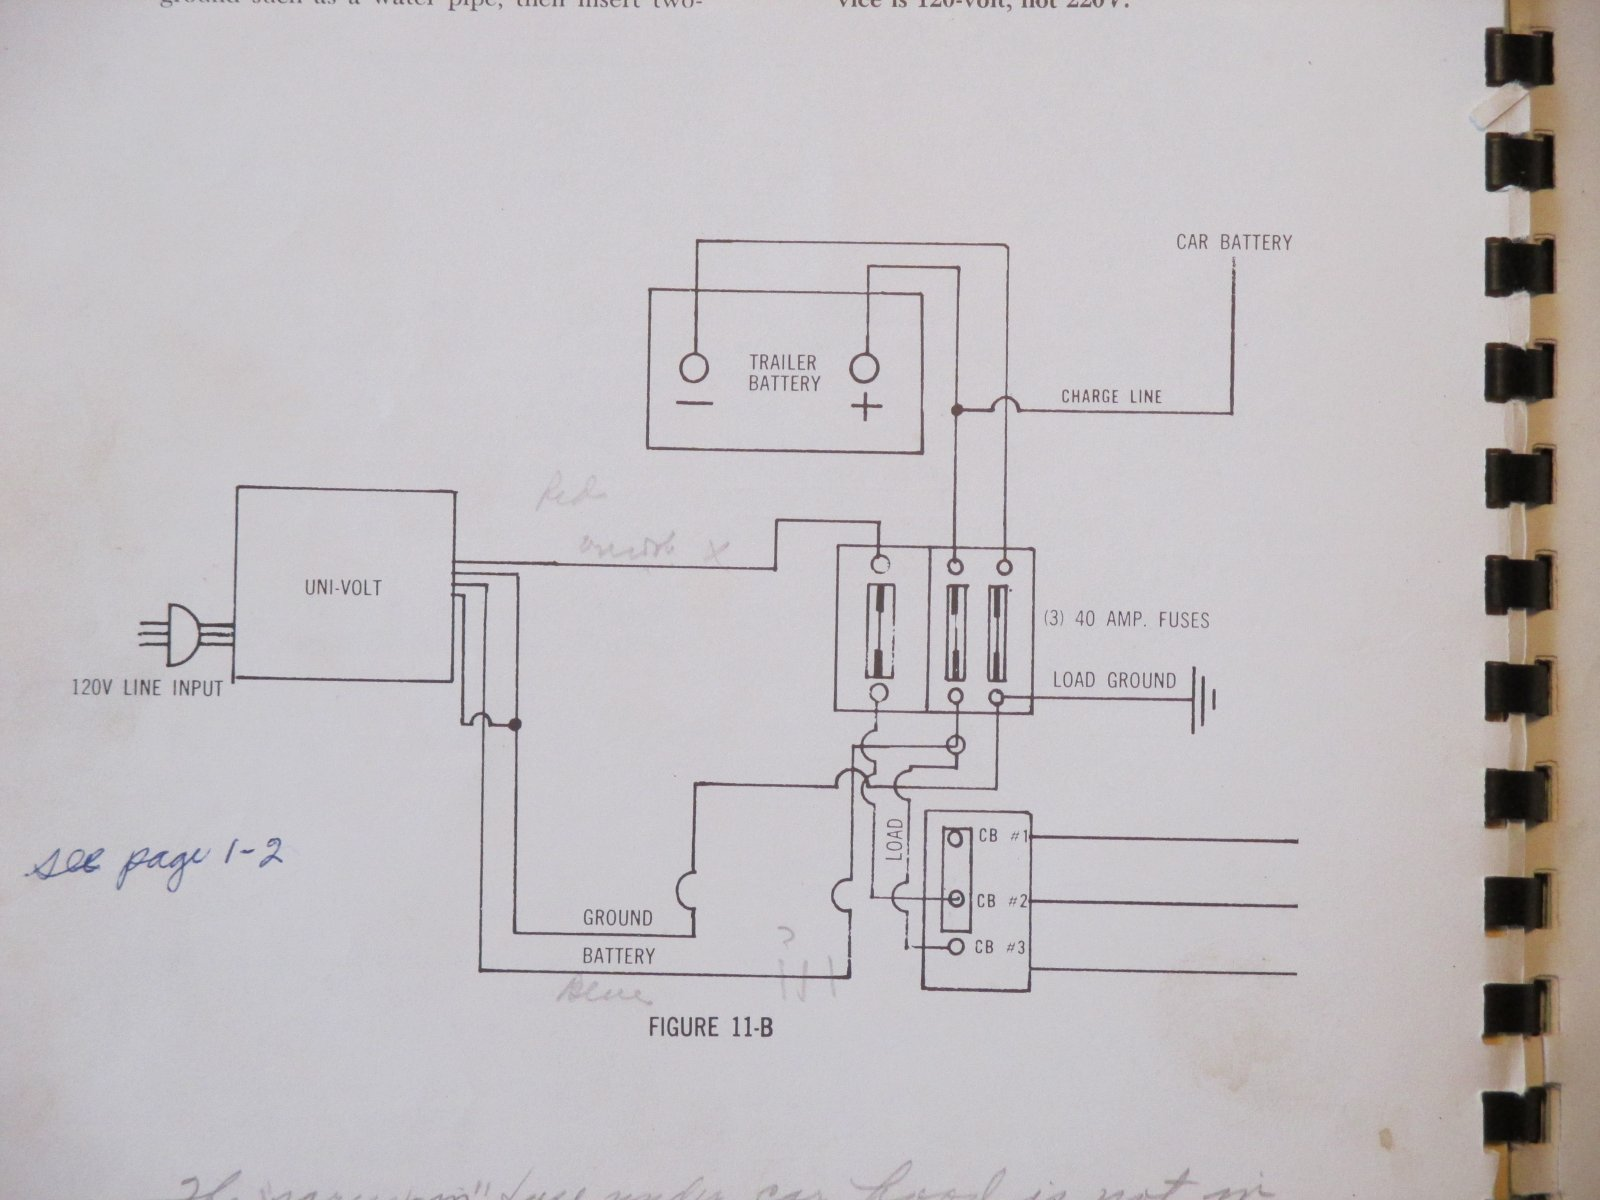 Click image for larger version  Name:1404 Univolt Wiring Diagram.jpg Views:120 Size:180.7 KB ID:226579